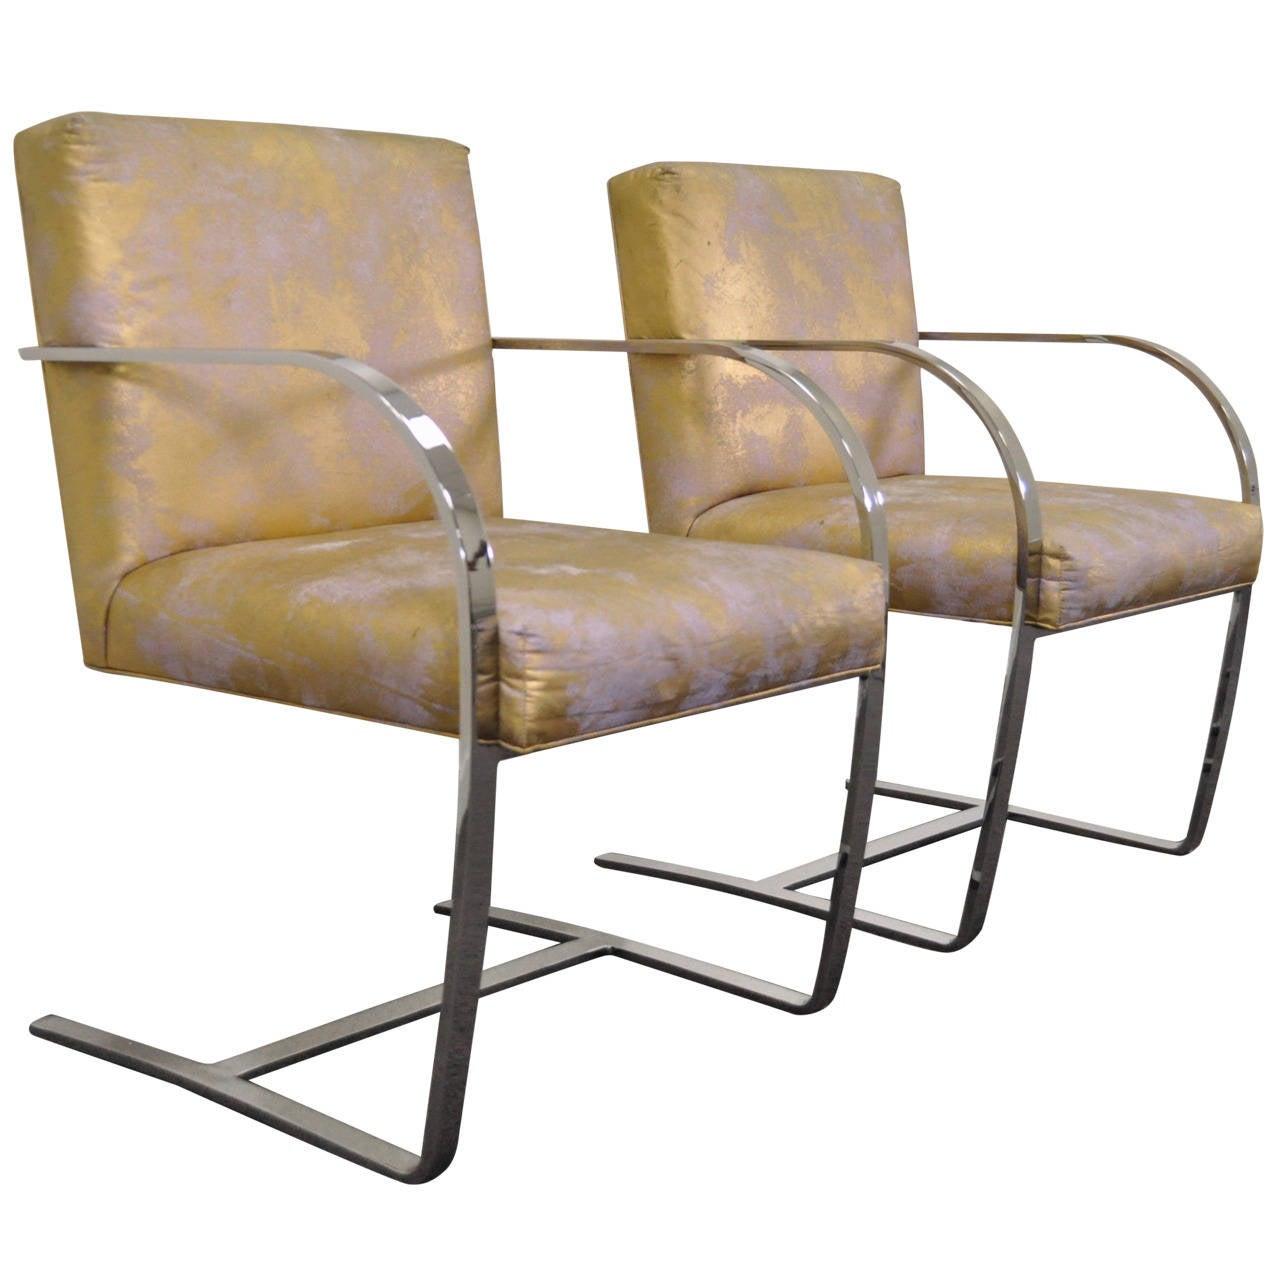 Pair of Cy Mann Flatbar Chrome Brno Style Chairs after Knoll Mies van der Rohe